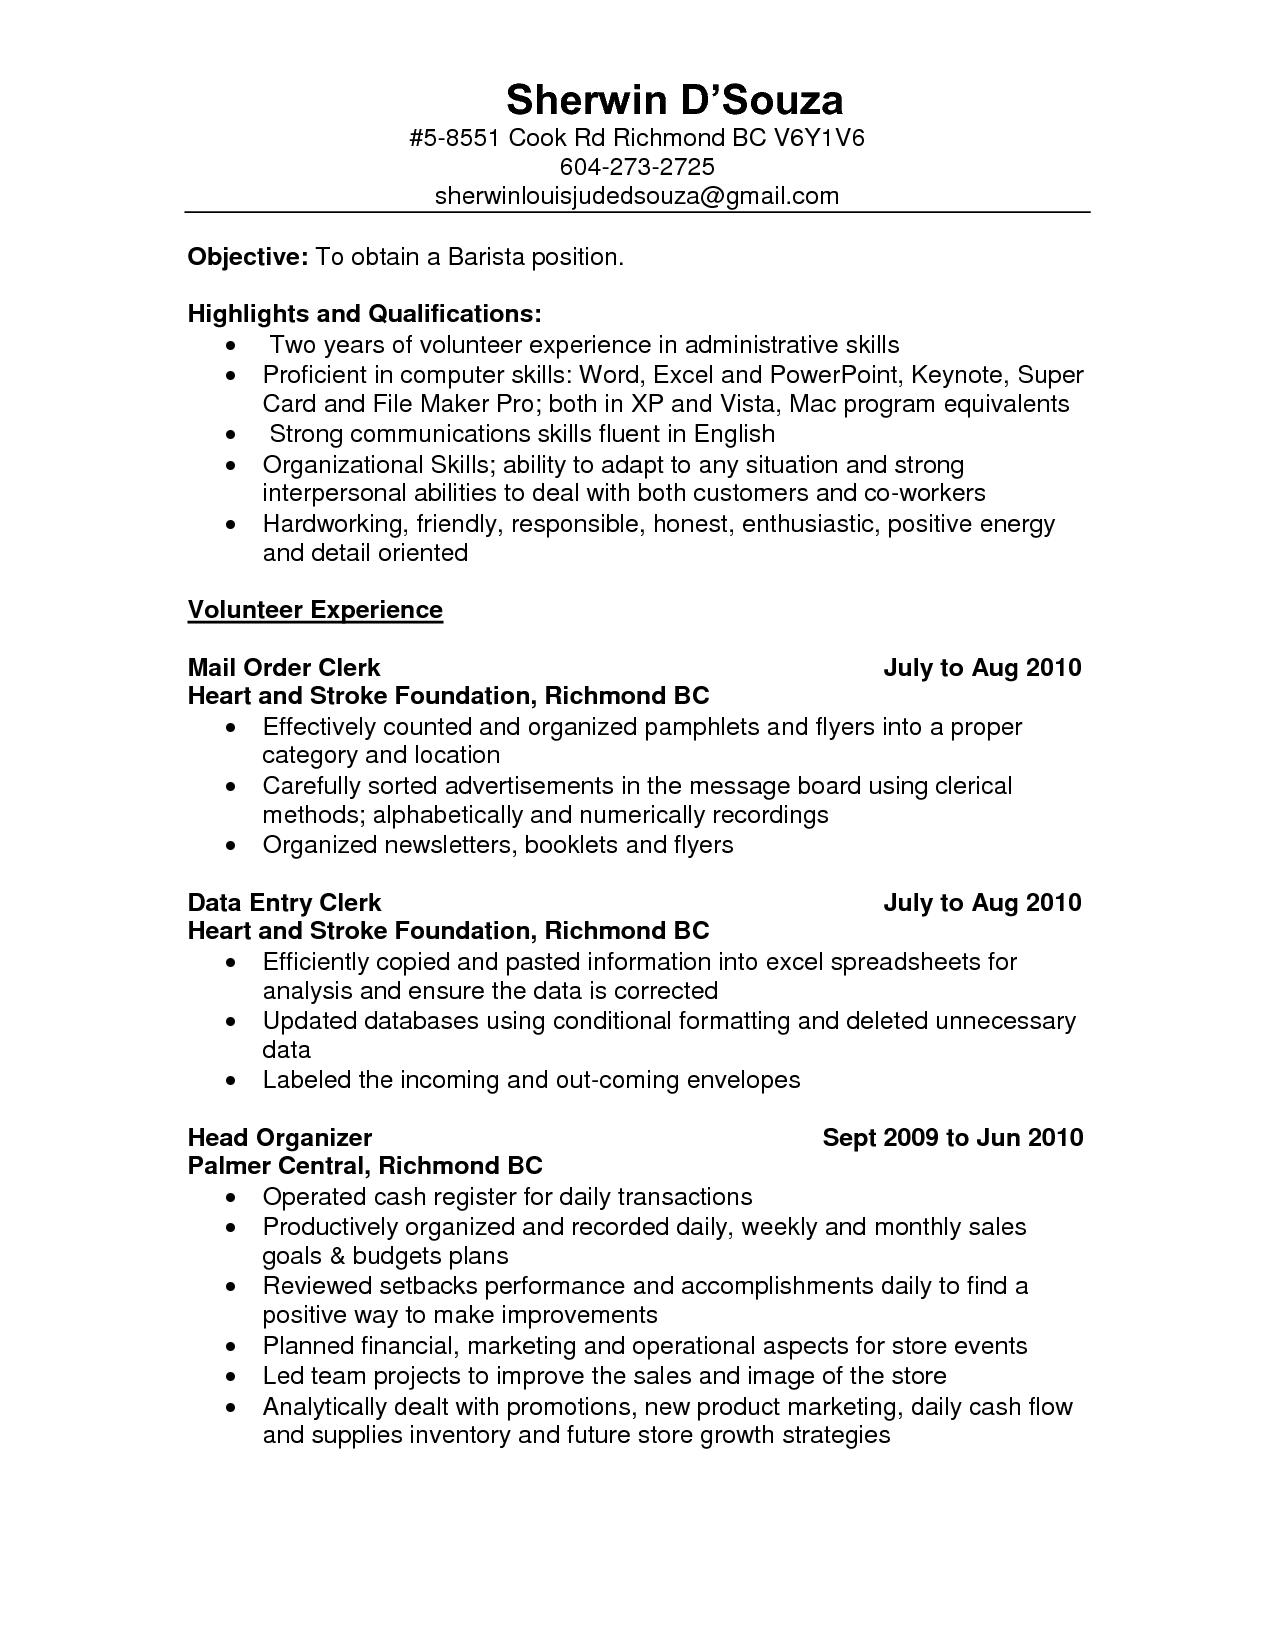 Resume Sample For Barista Resumesdesign Sales Resume Examples Resume Examples Sample Resume